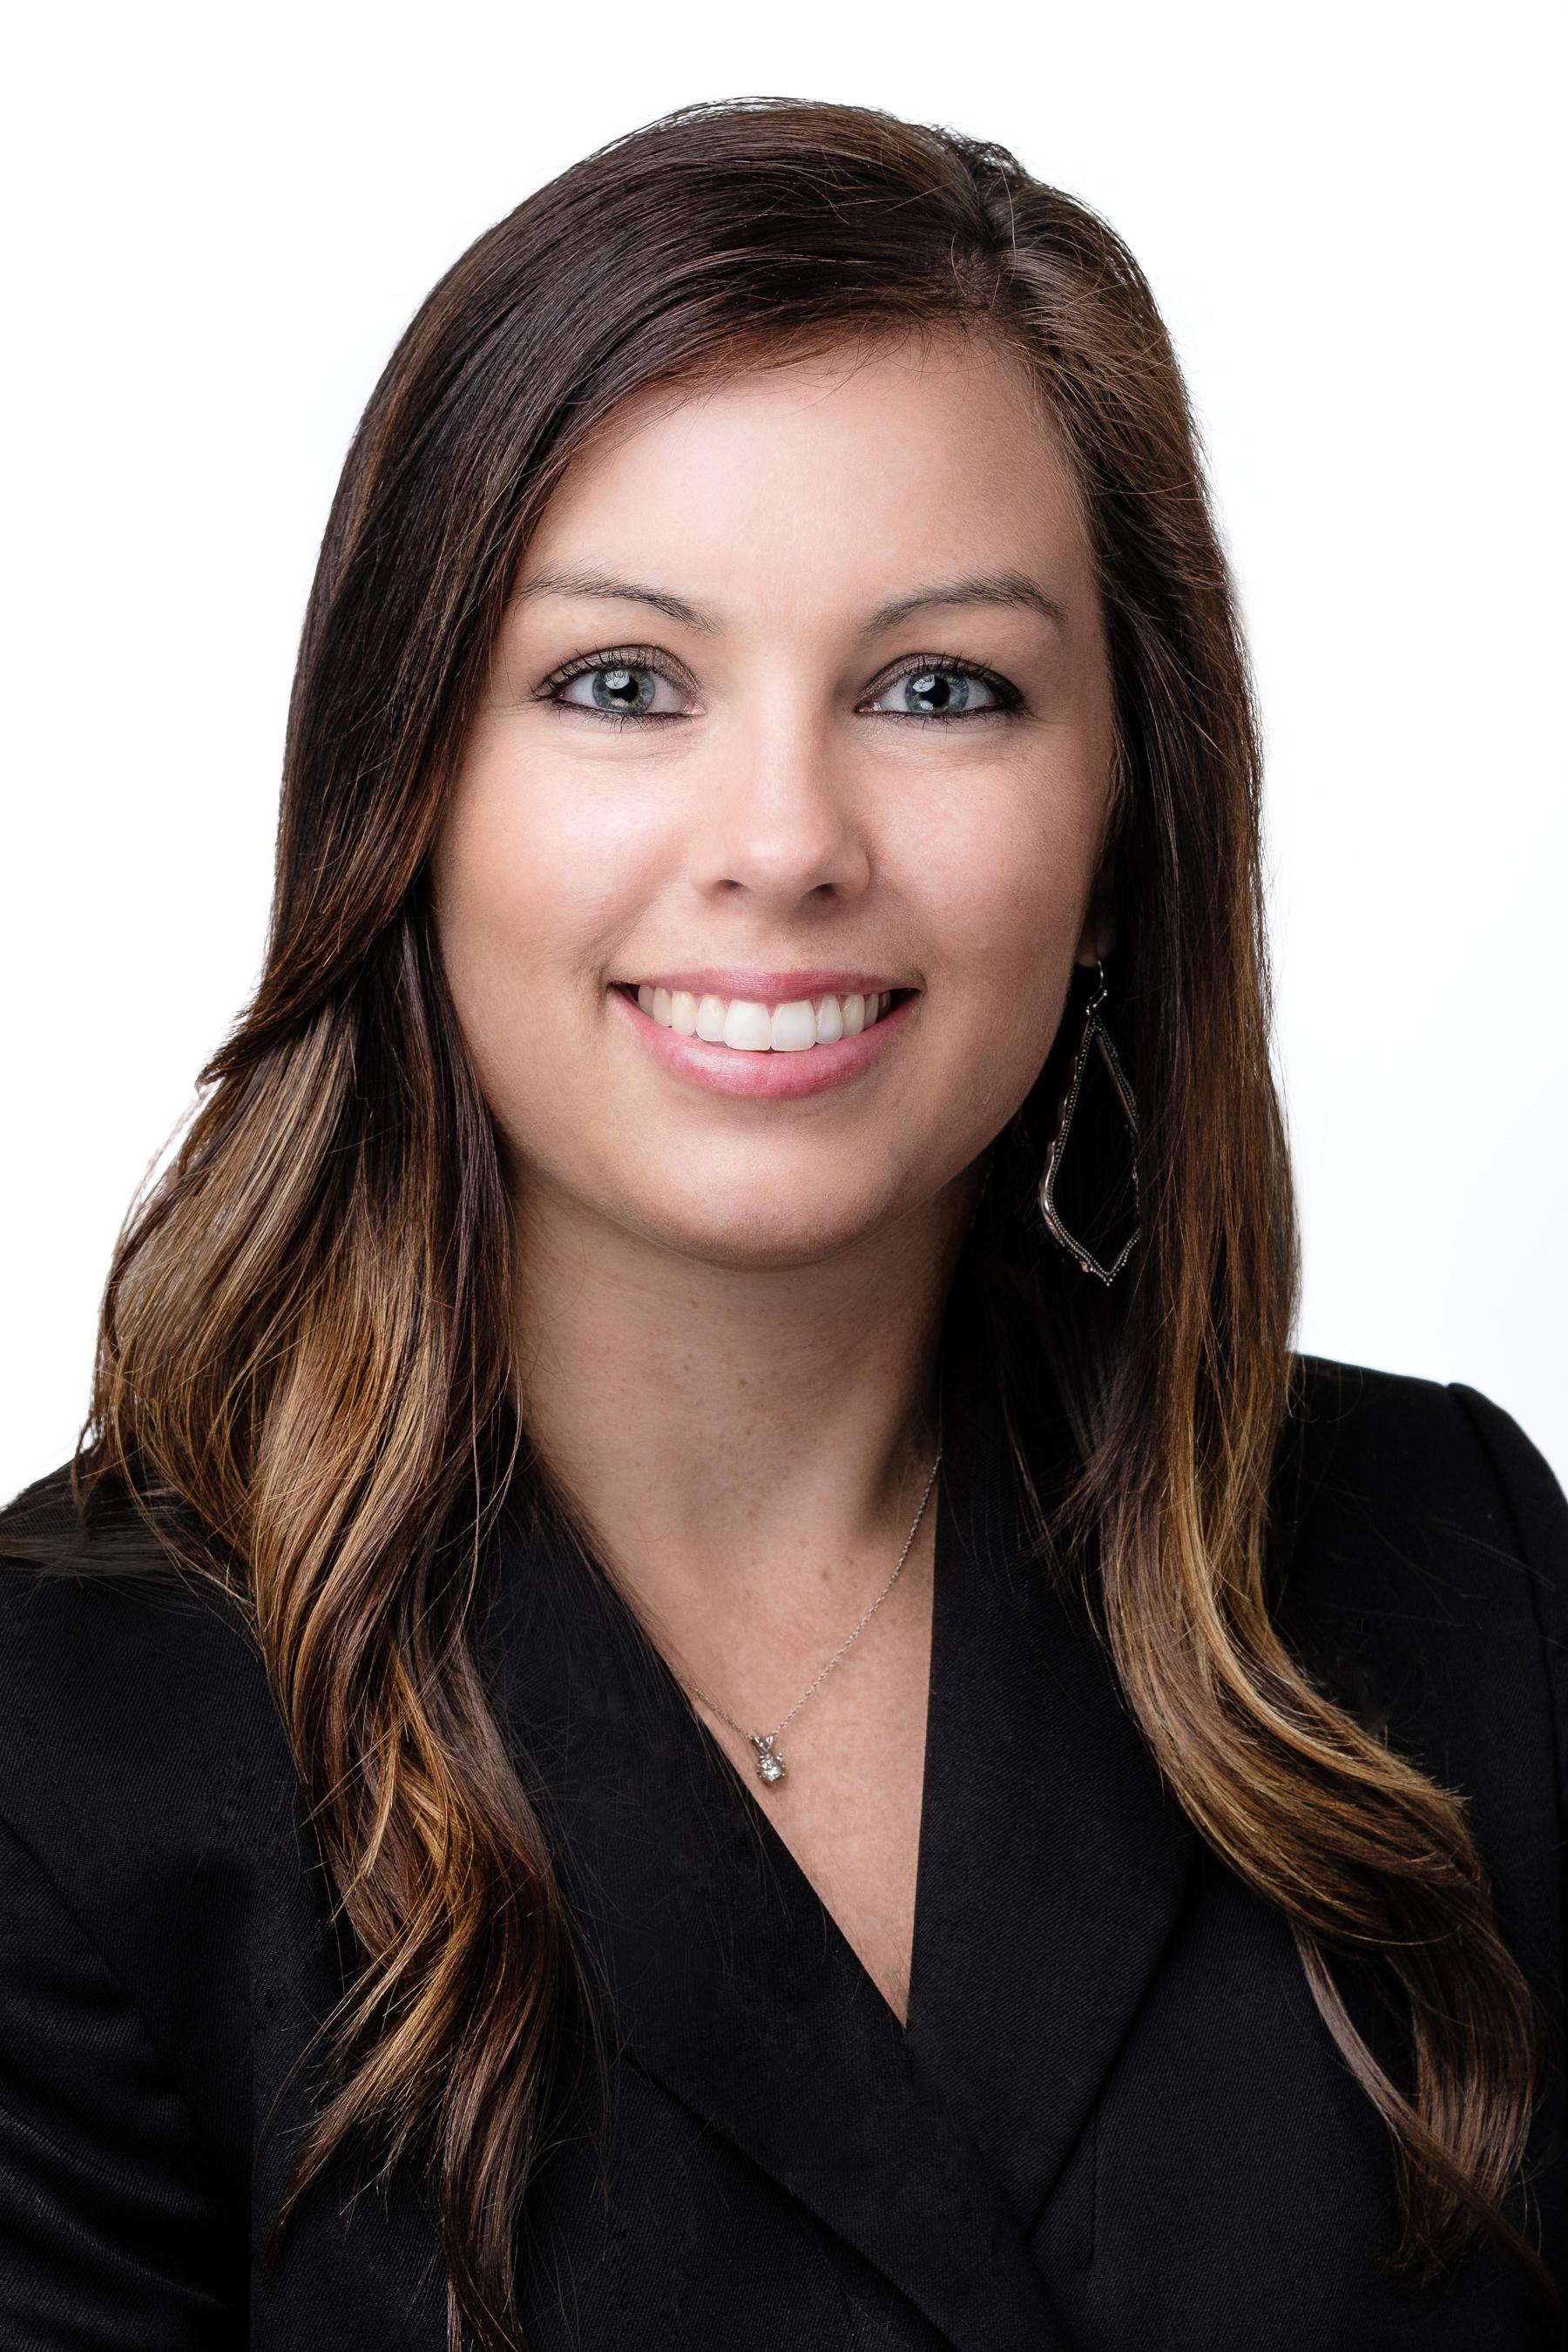 Cortney Lawson - Mortgage Loan Officer- Guaranty Bank & Trust